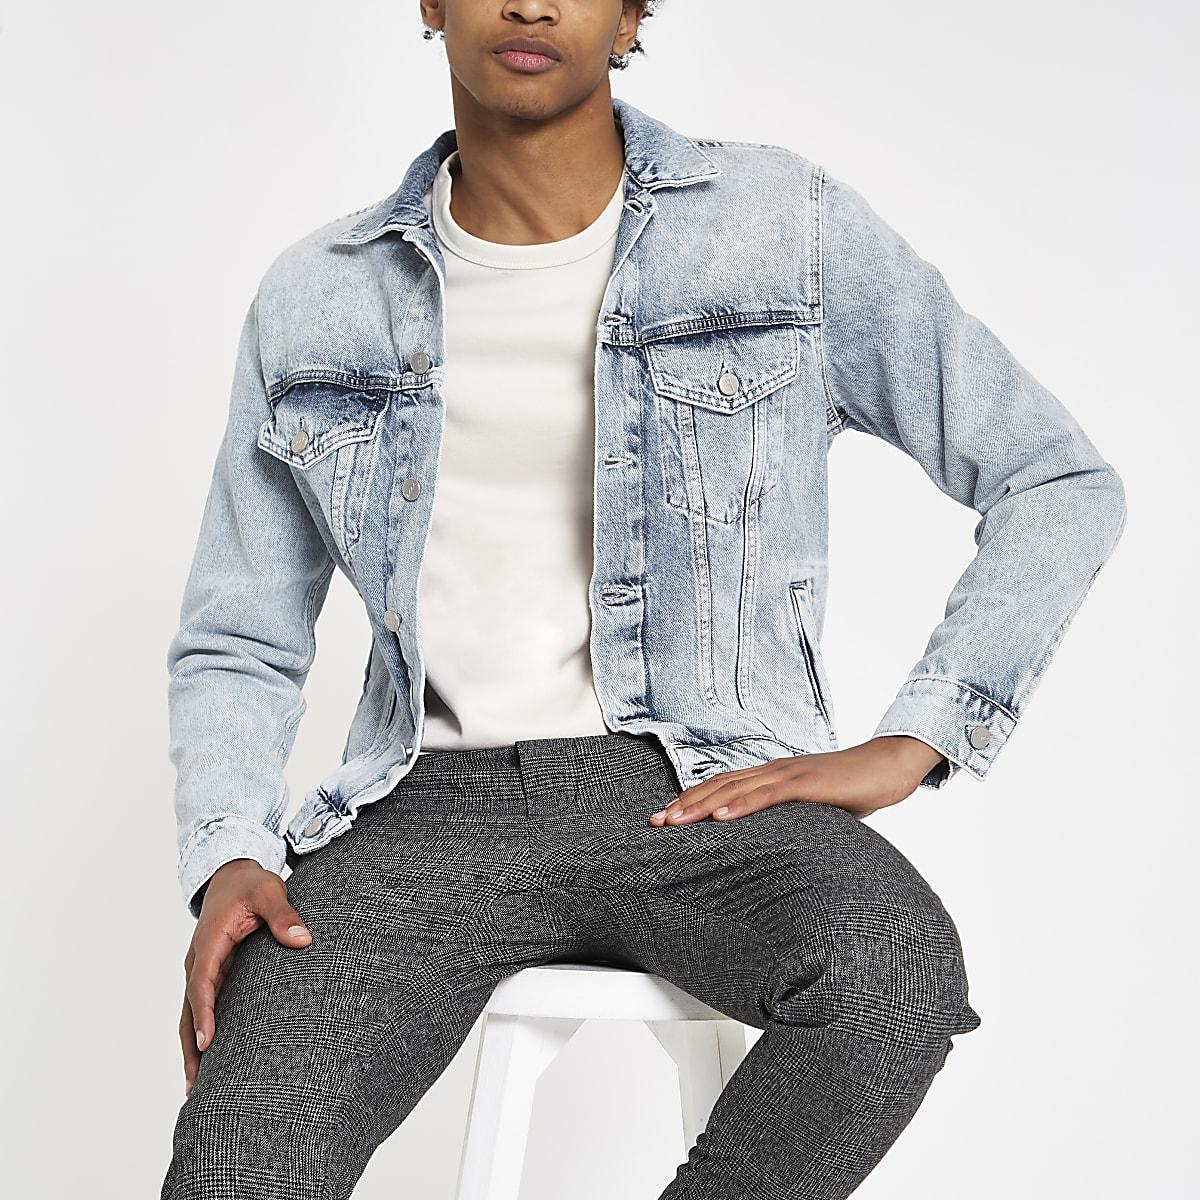 e82129baa99f Pepe Jeans light blue denim jacket - Jackets - Coats & Jackets - men